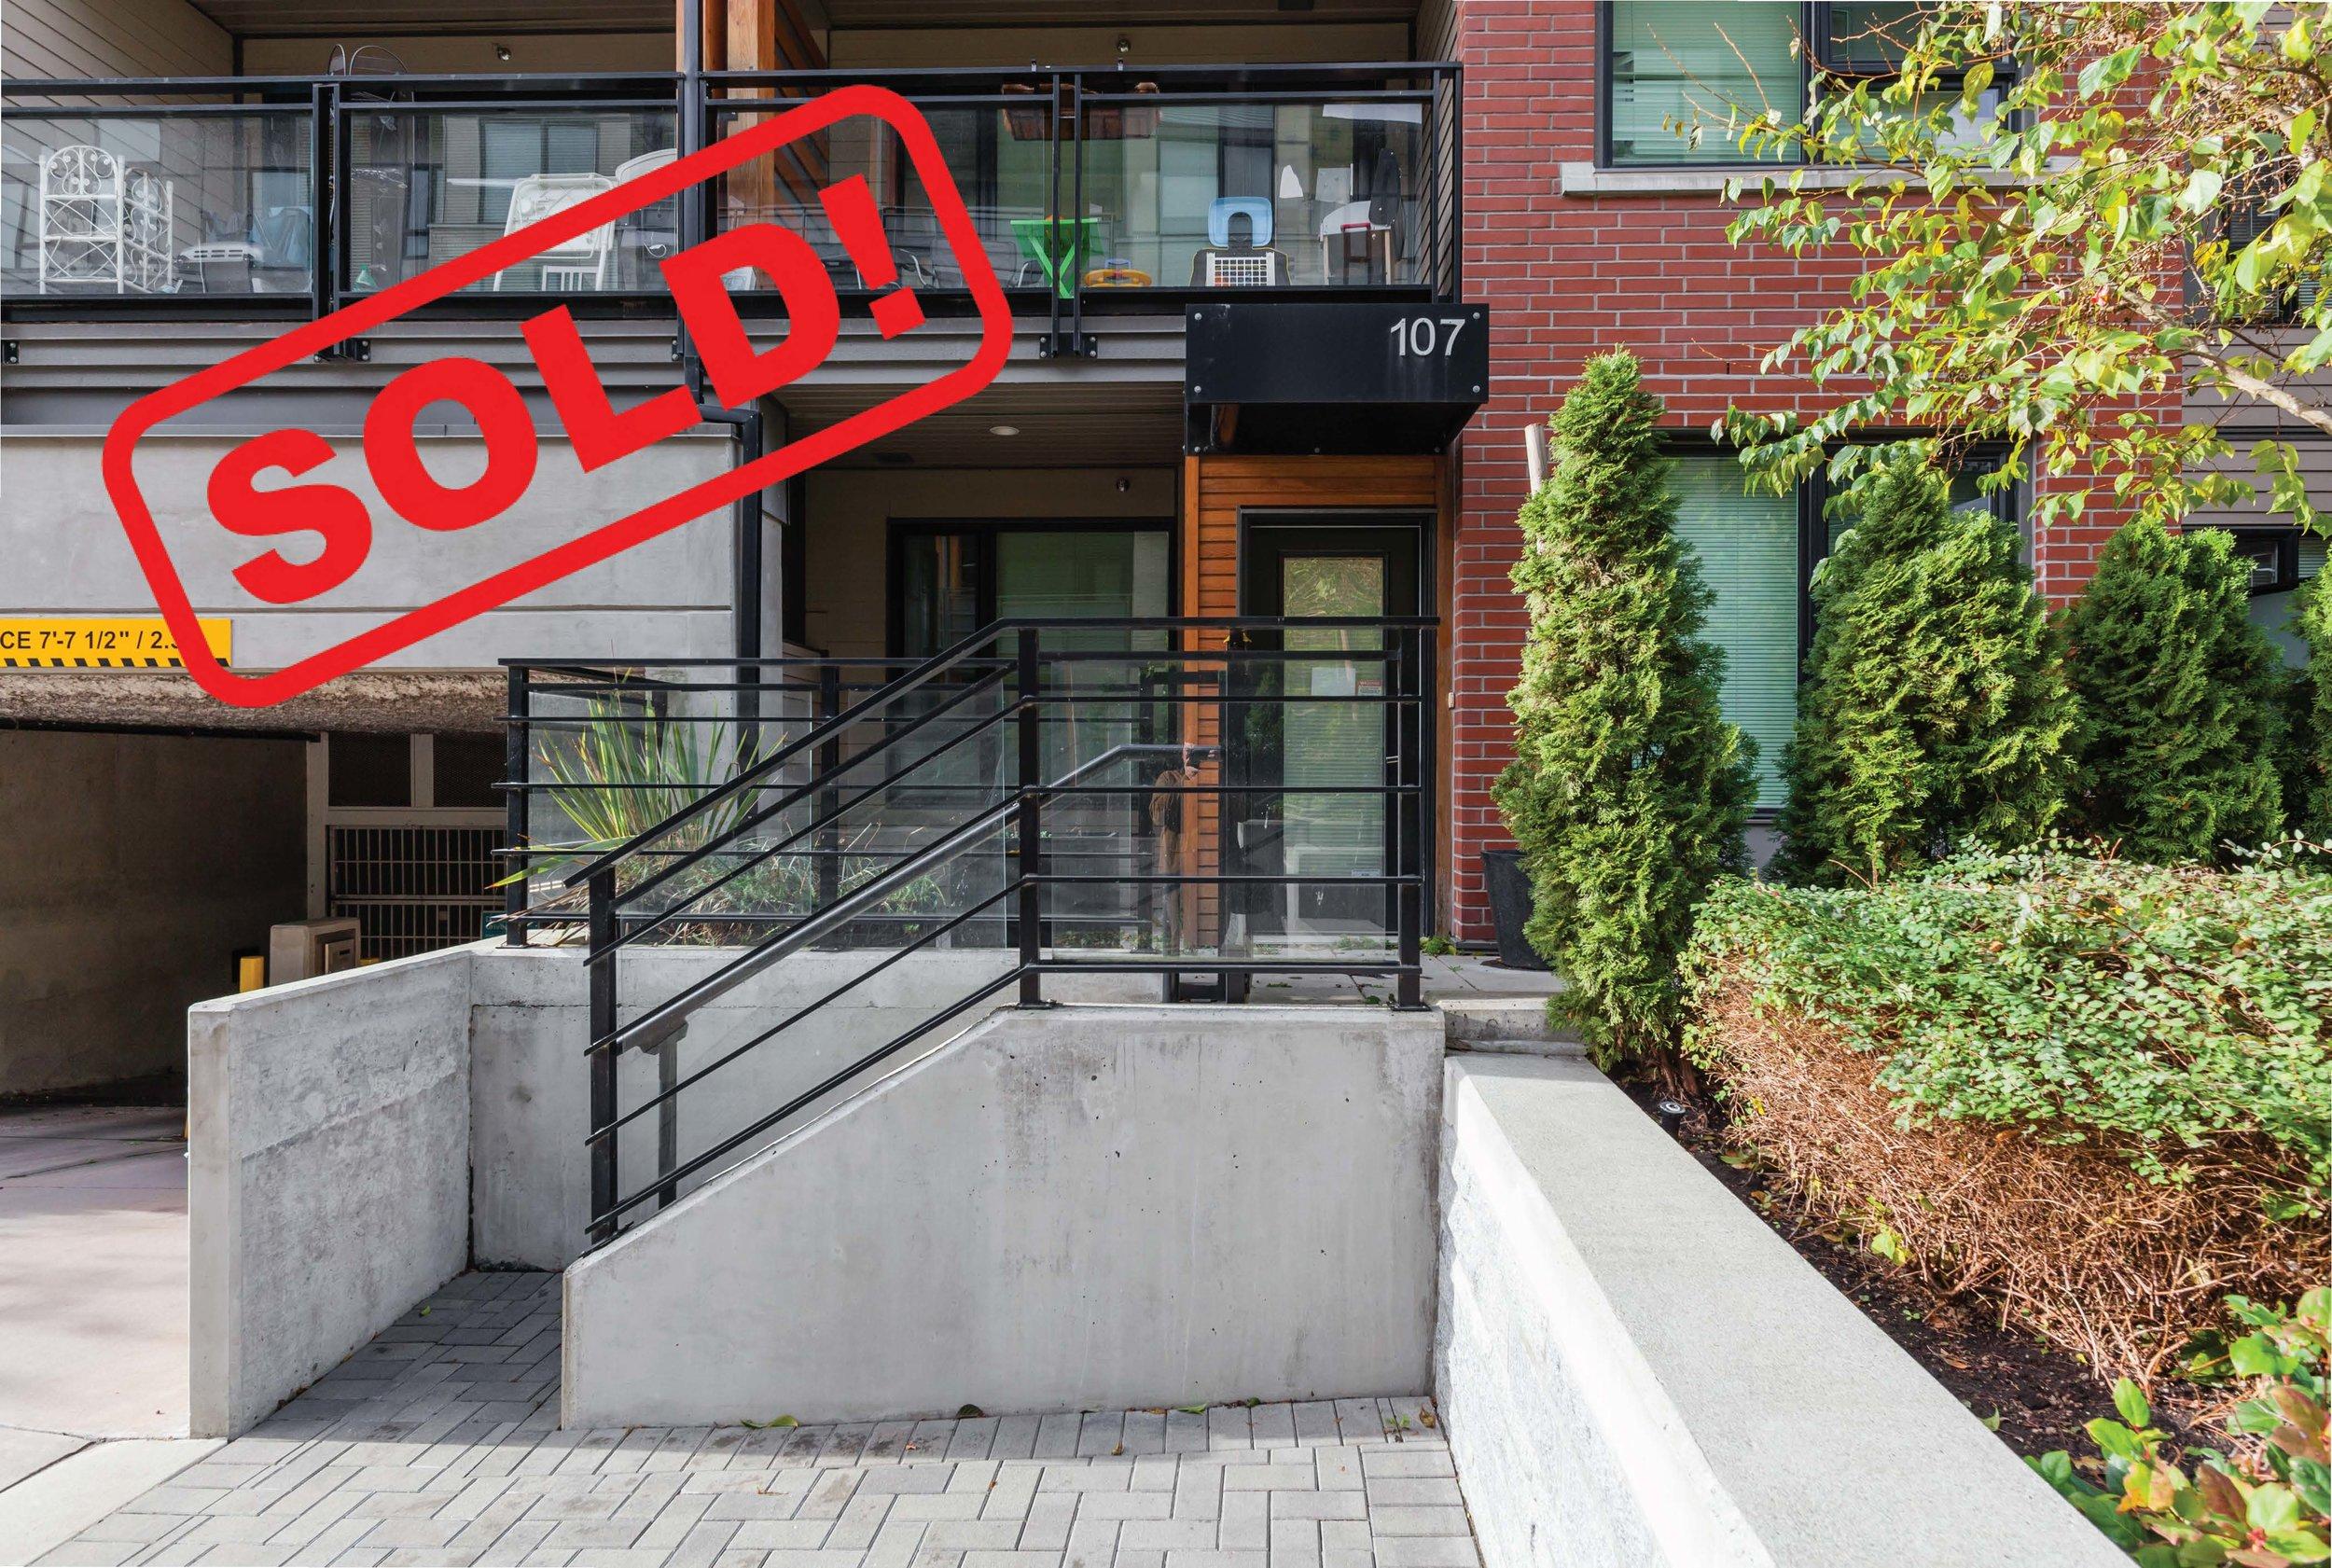 107-3133 Riverwalk Avenue   sold for: $703,000  2 Bed | 2 Bath | 893 SF